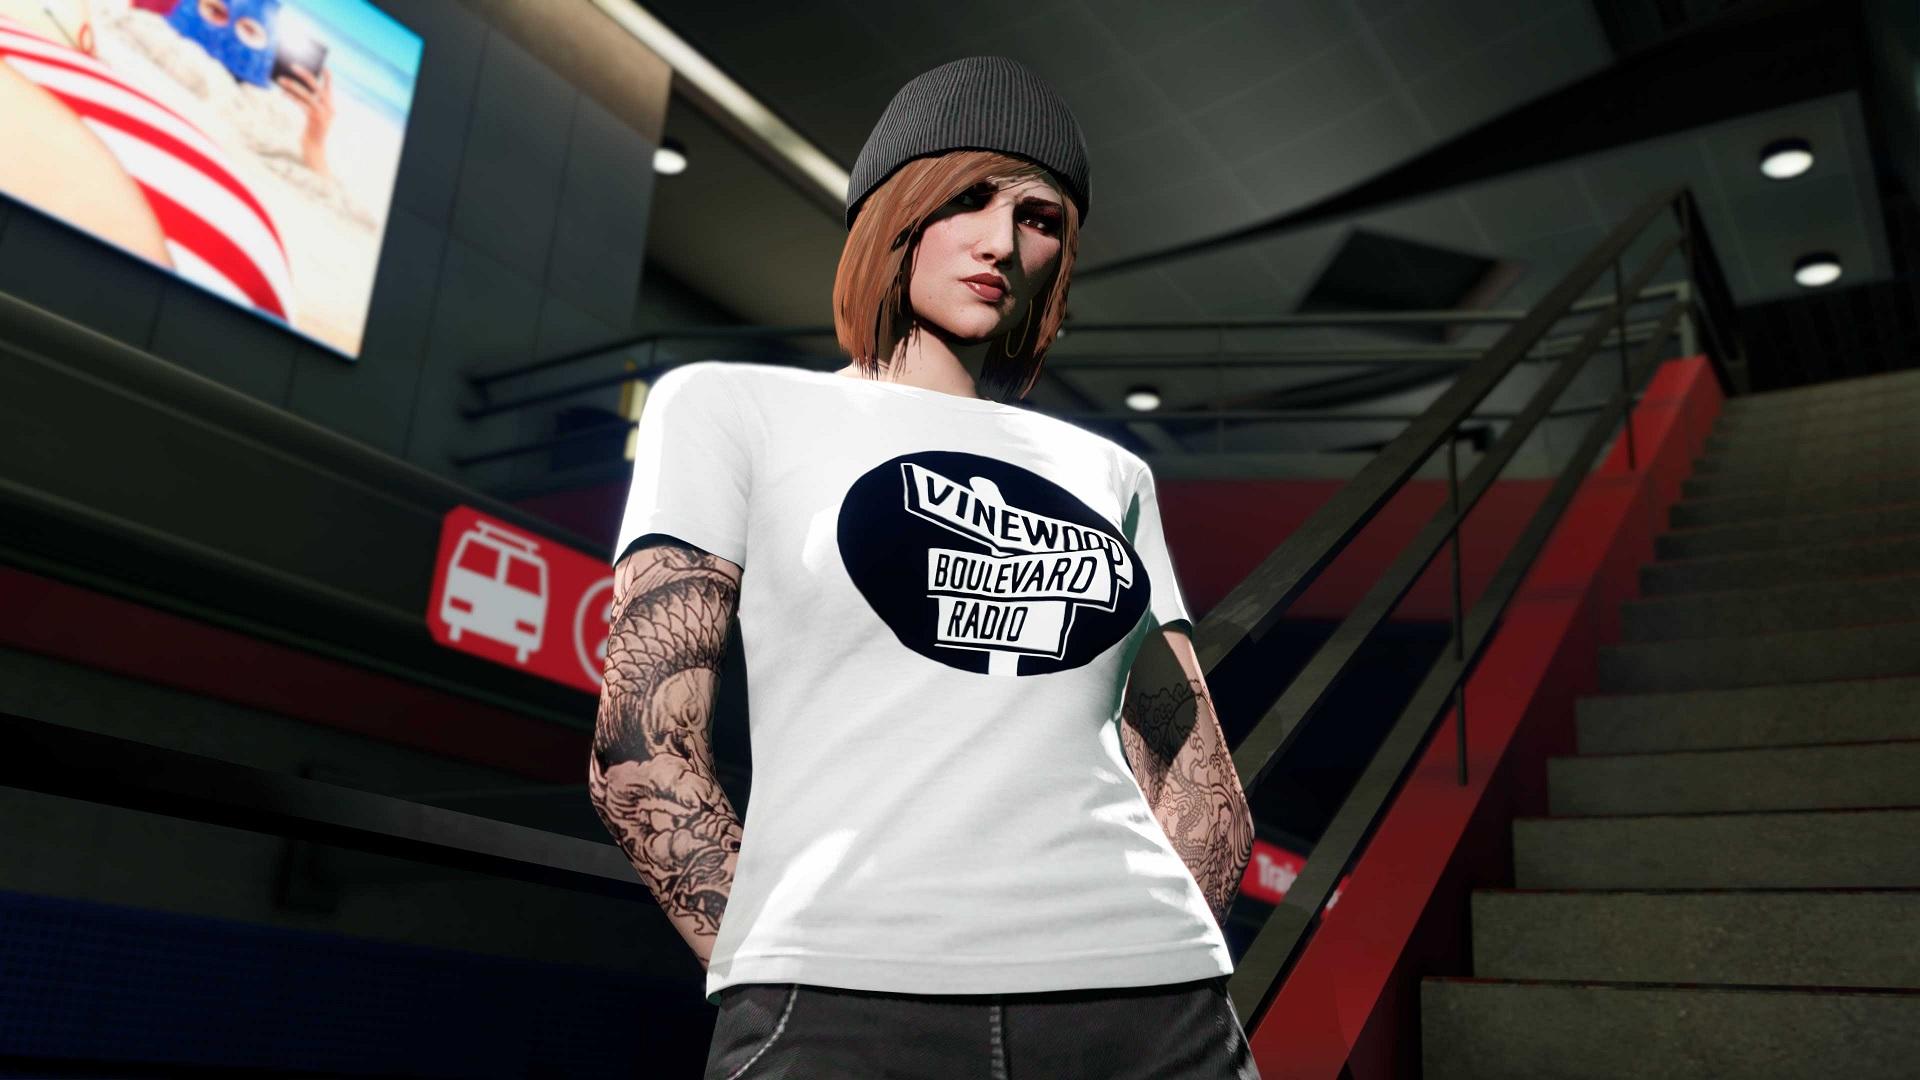 t-shirt Vinewood Boulevard Radio